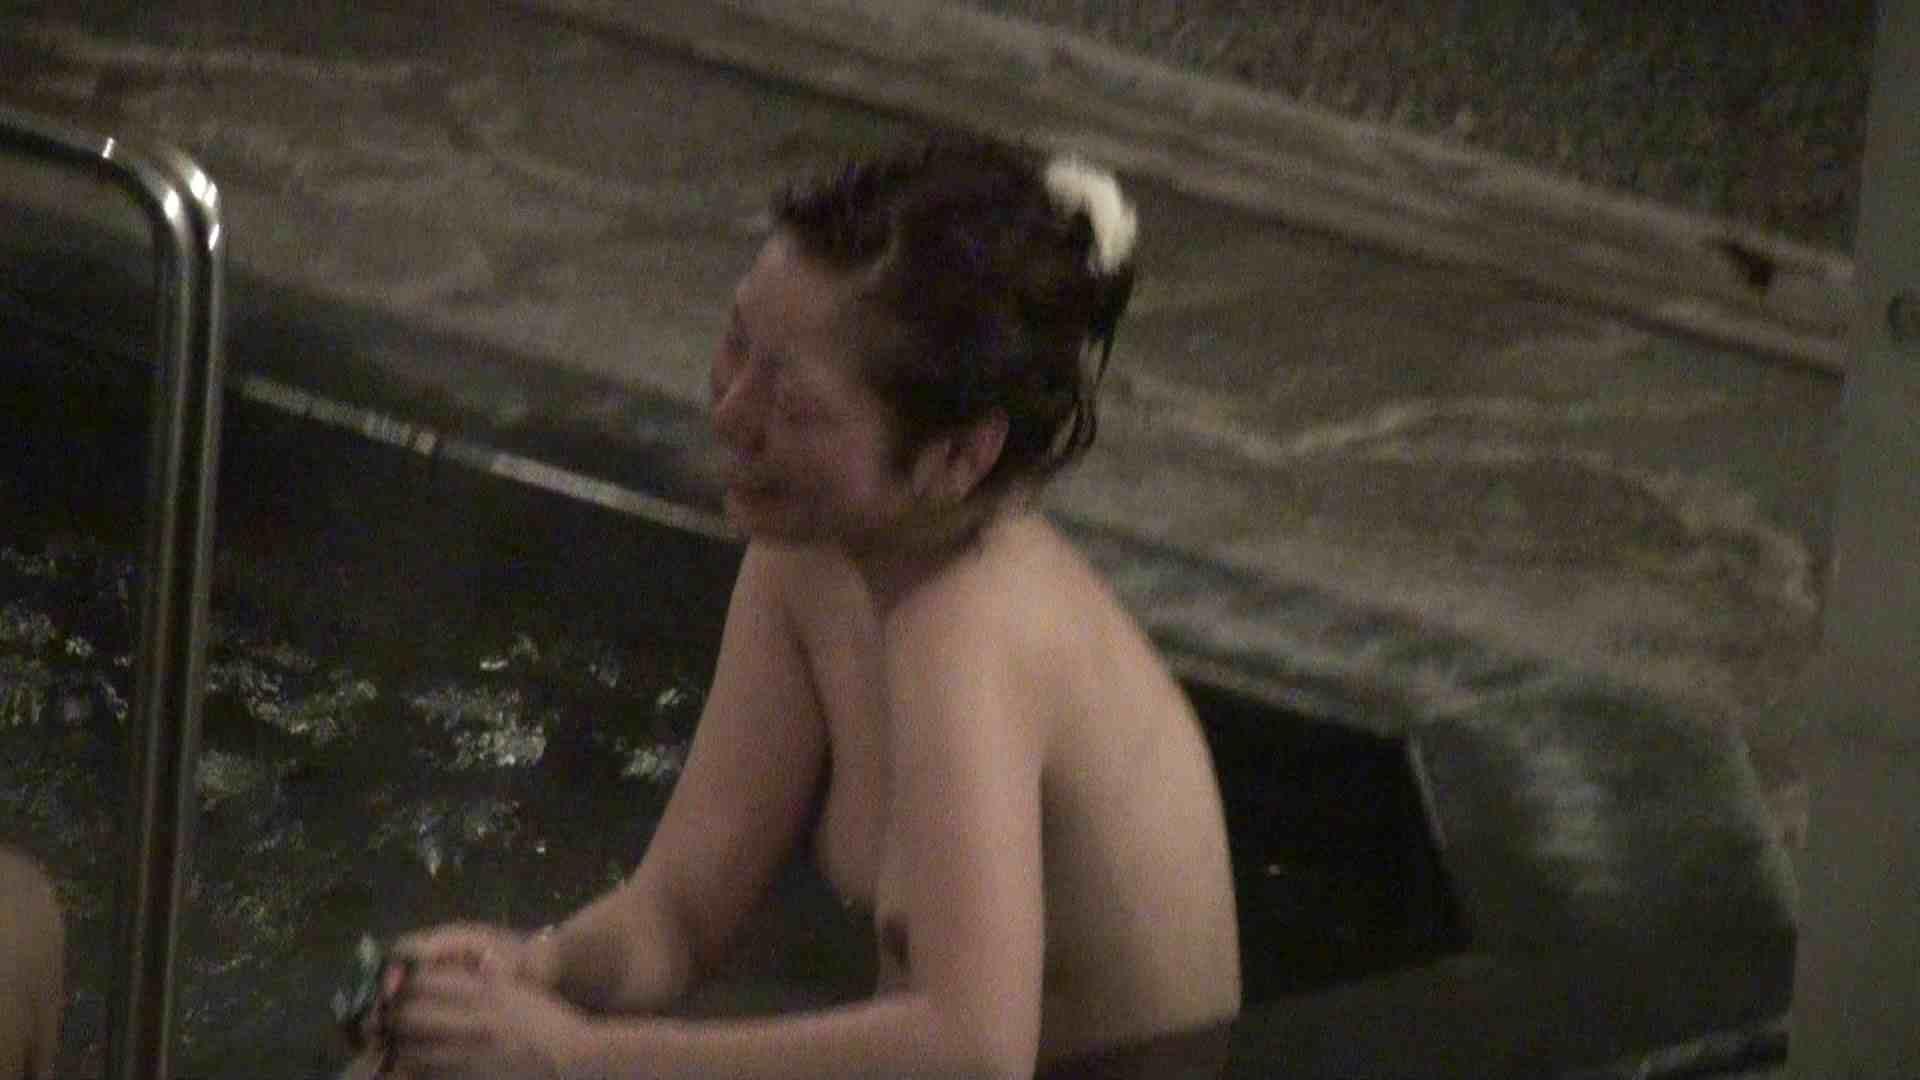 Aquaな露天風呂Vol.422 盗撮映像  61Pix 42